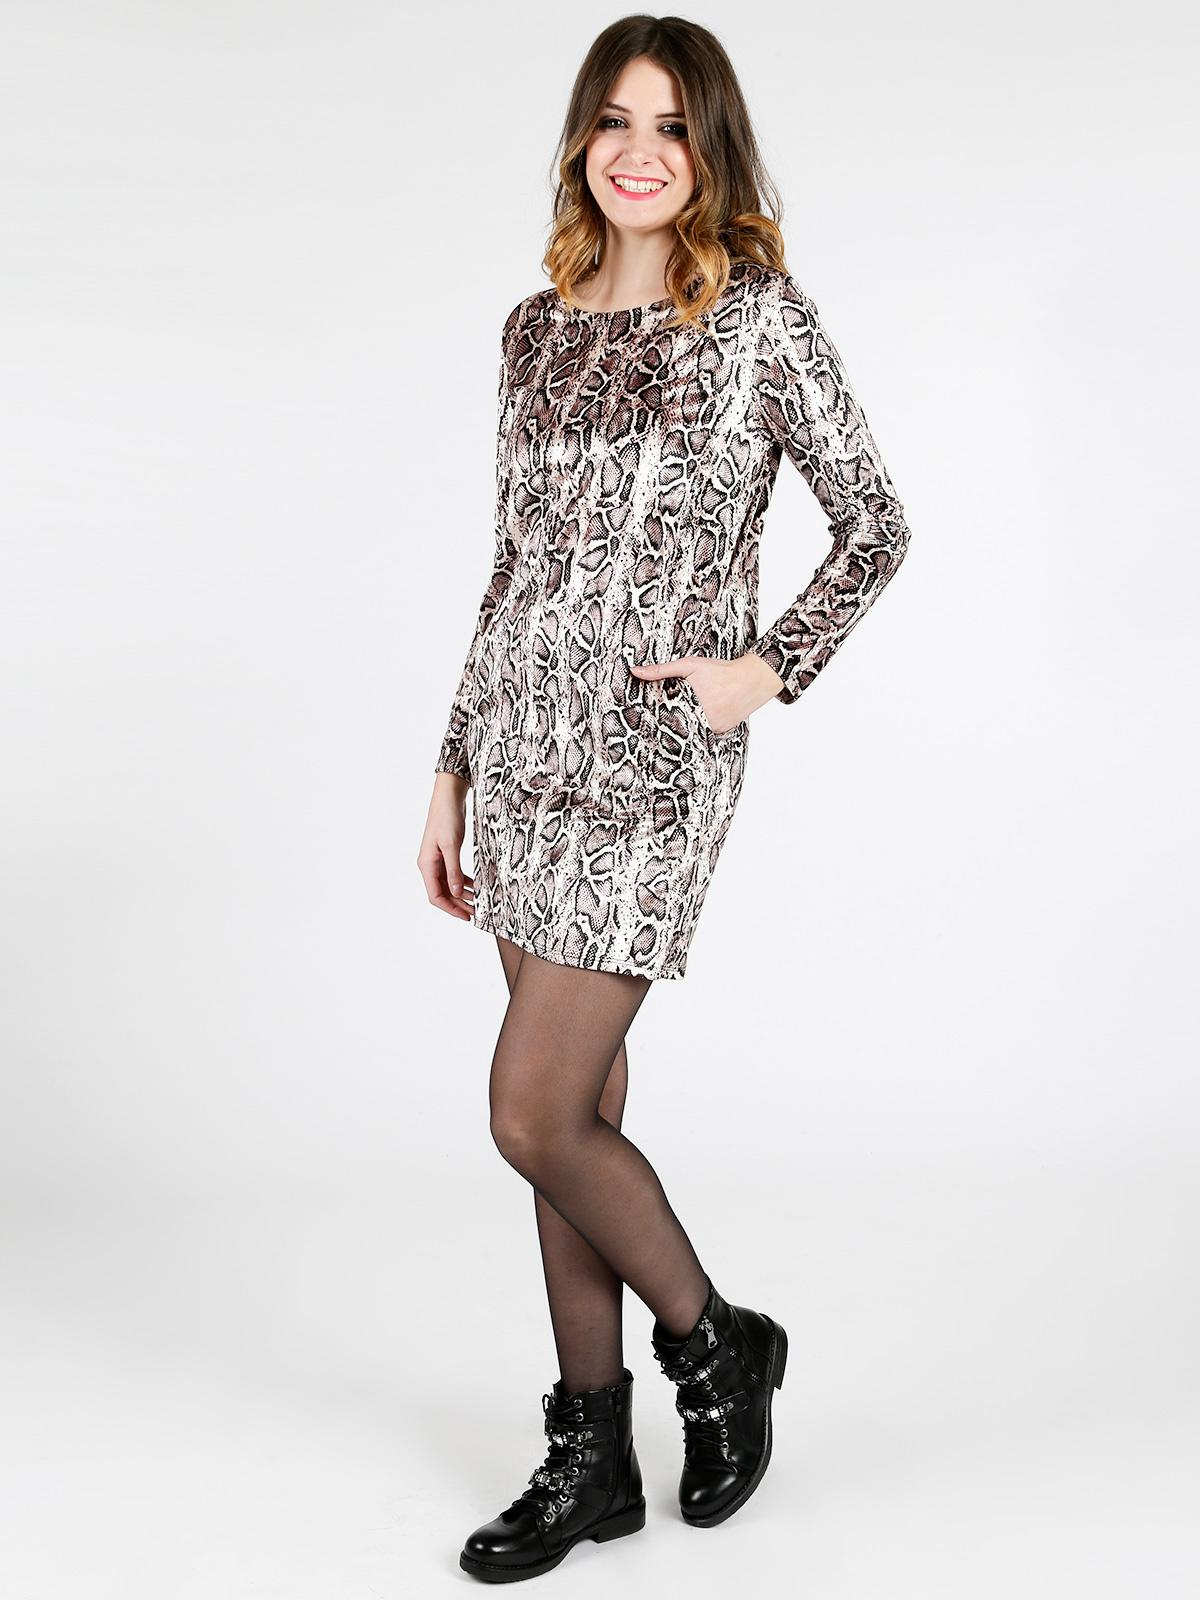 buy online 21341 be025 Vestito corto animalier solada | MecShopping